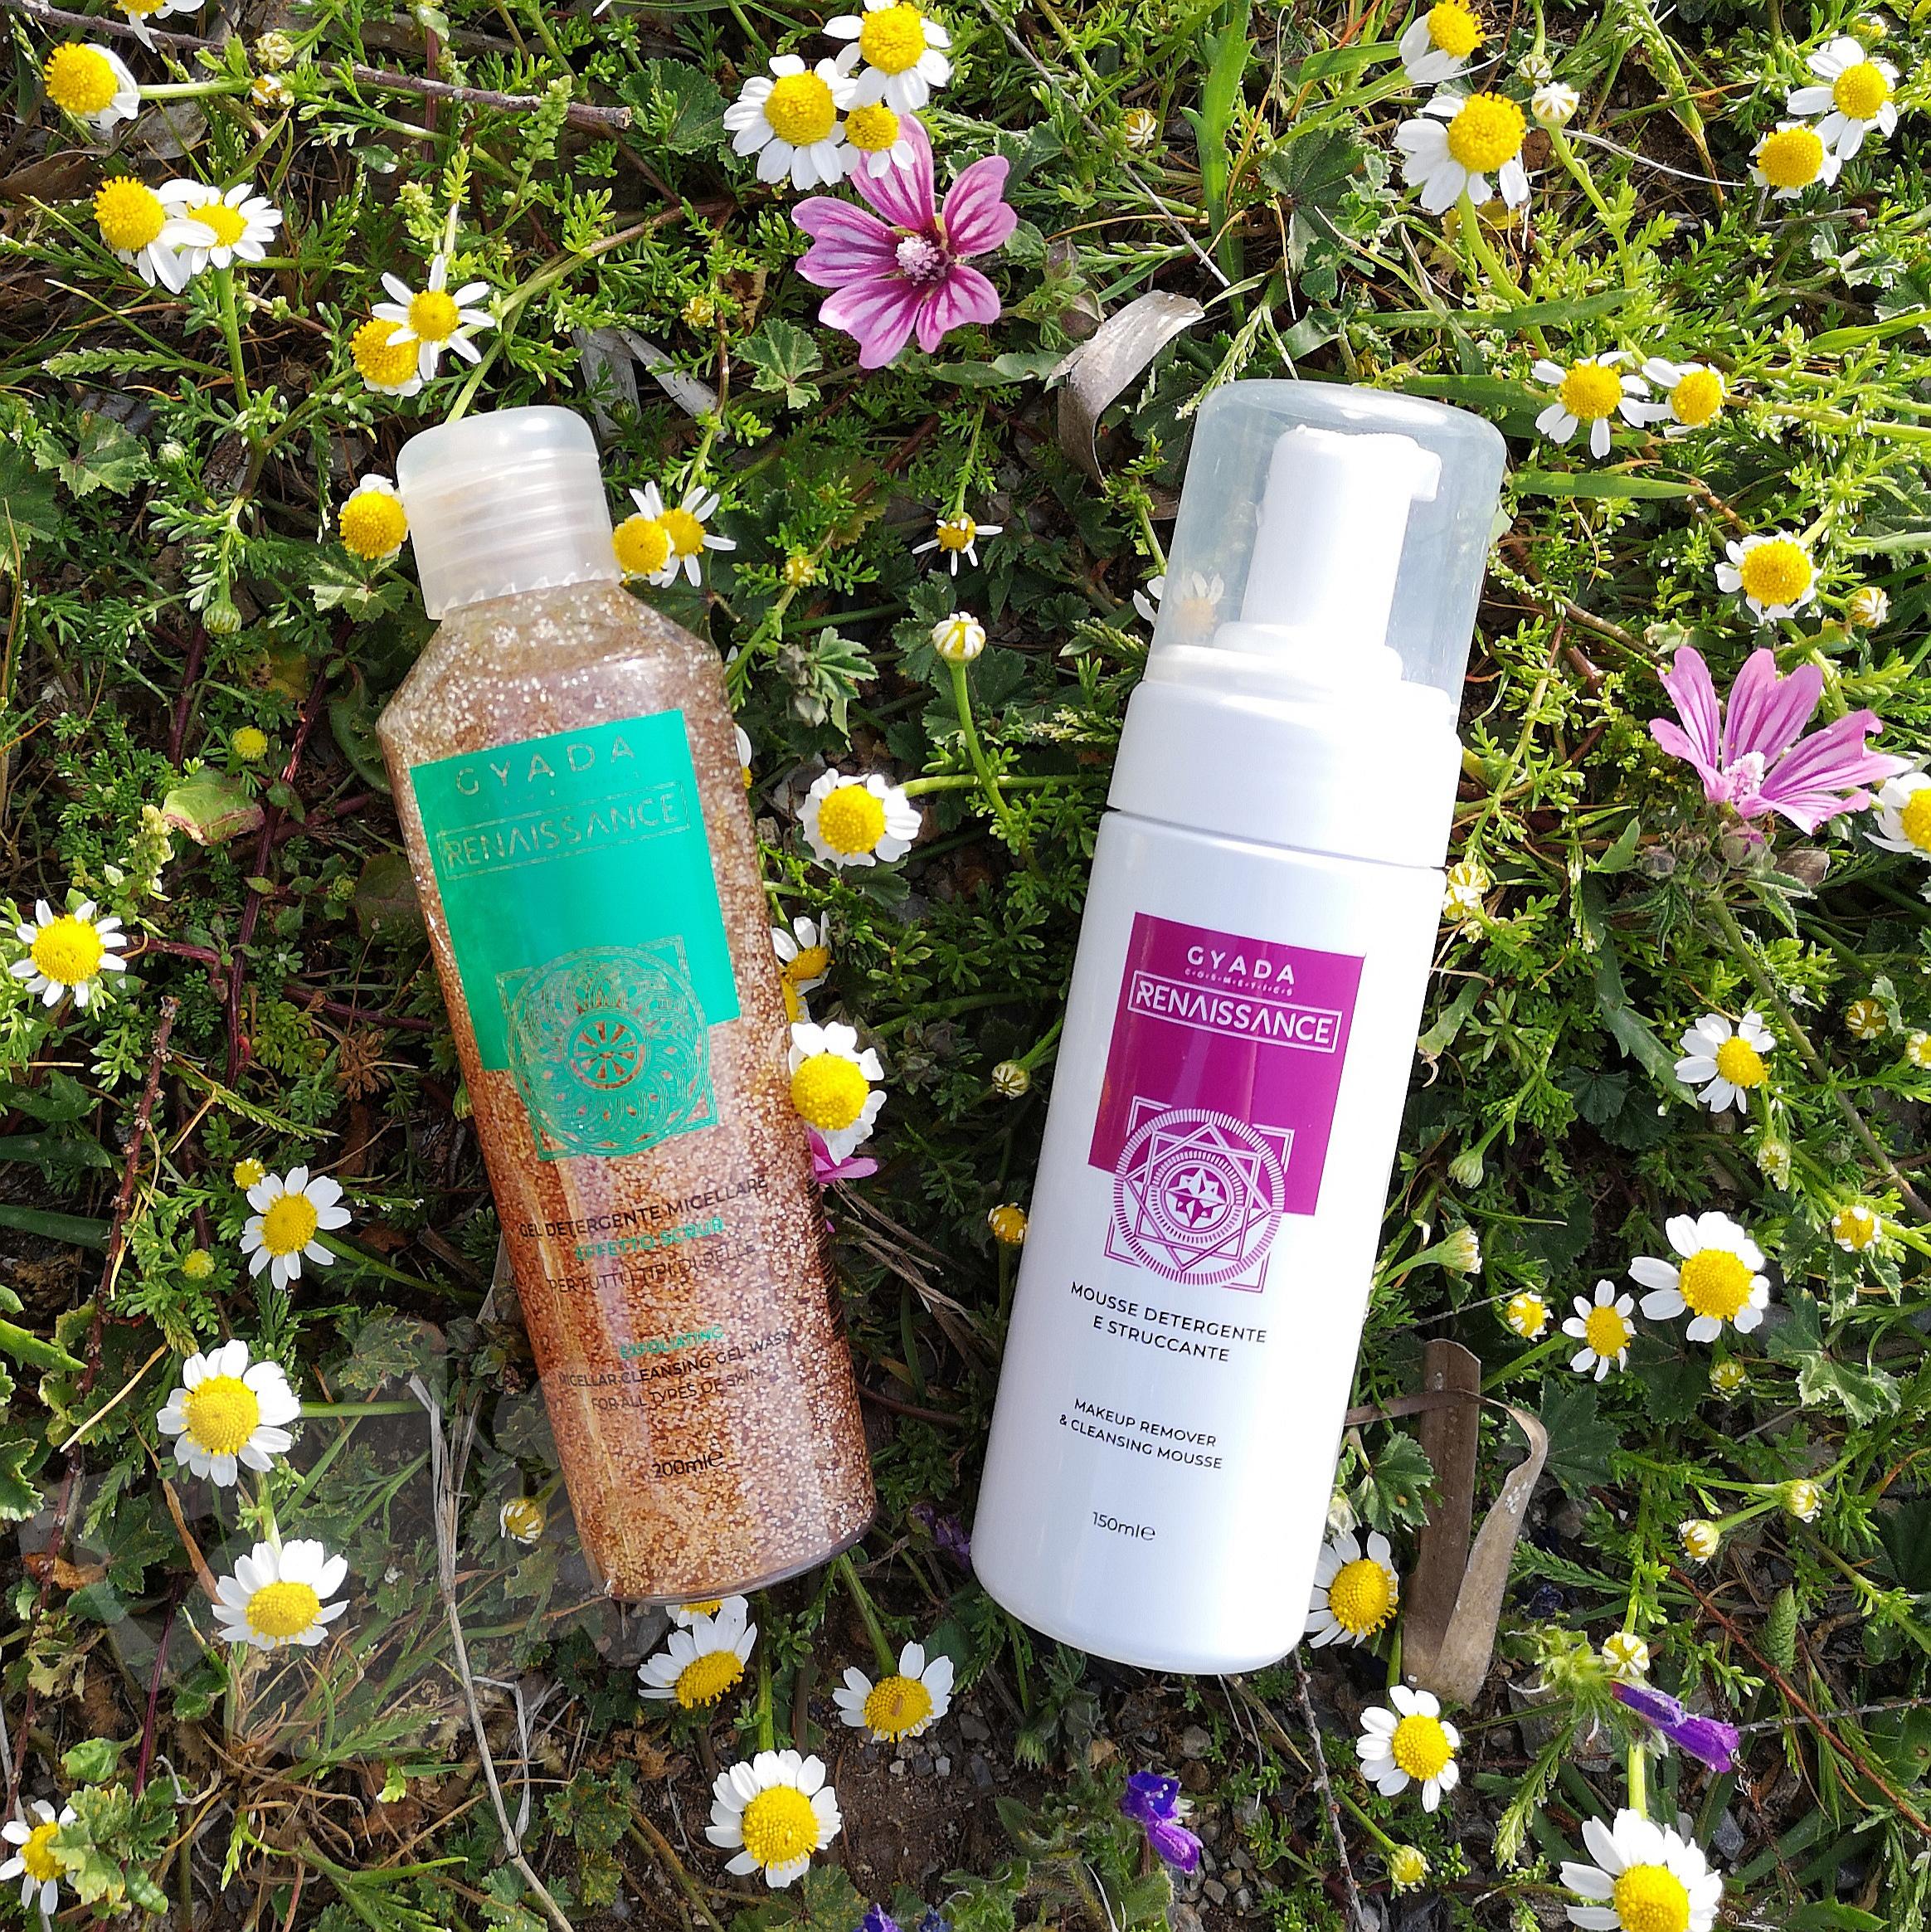 Gyada e la linea Reinassance – mousse detergente e gel scrub